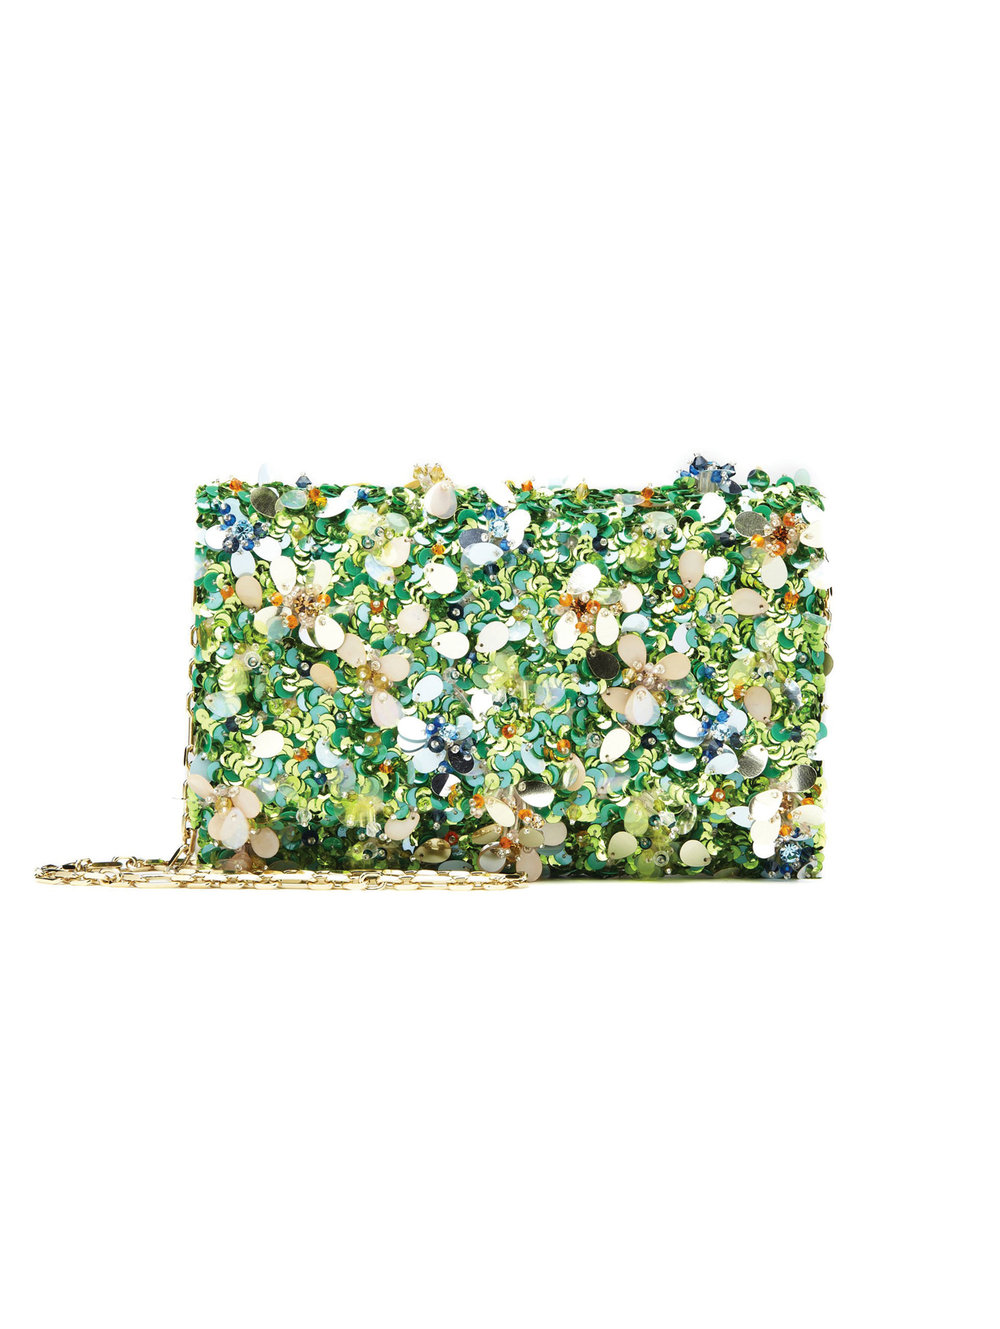 4.Multi Embroidered Satin Dede Bag with Swarovski Crystals by Oscar de la Renta $2,607, oscardelarenta.com